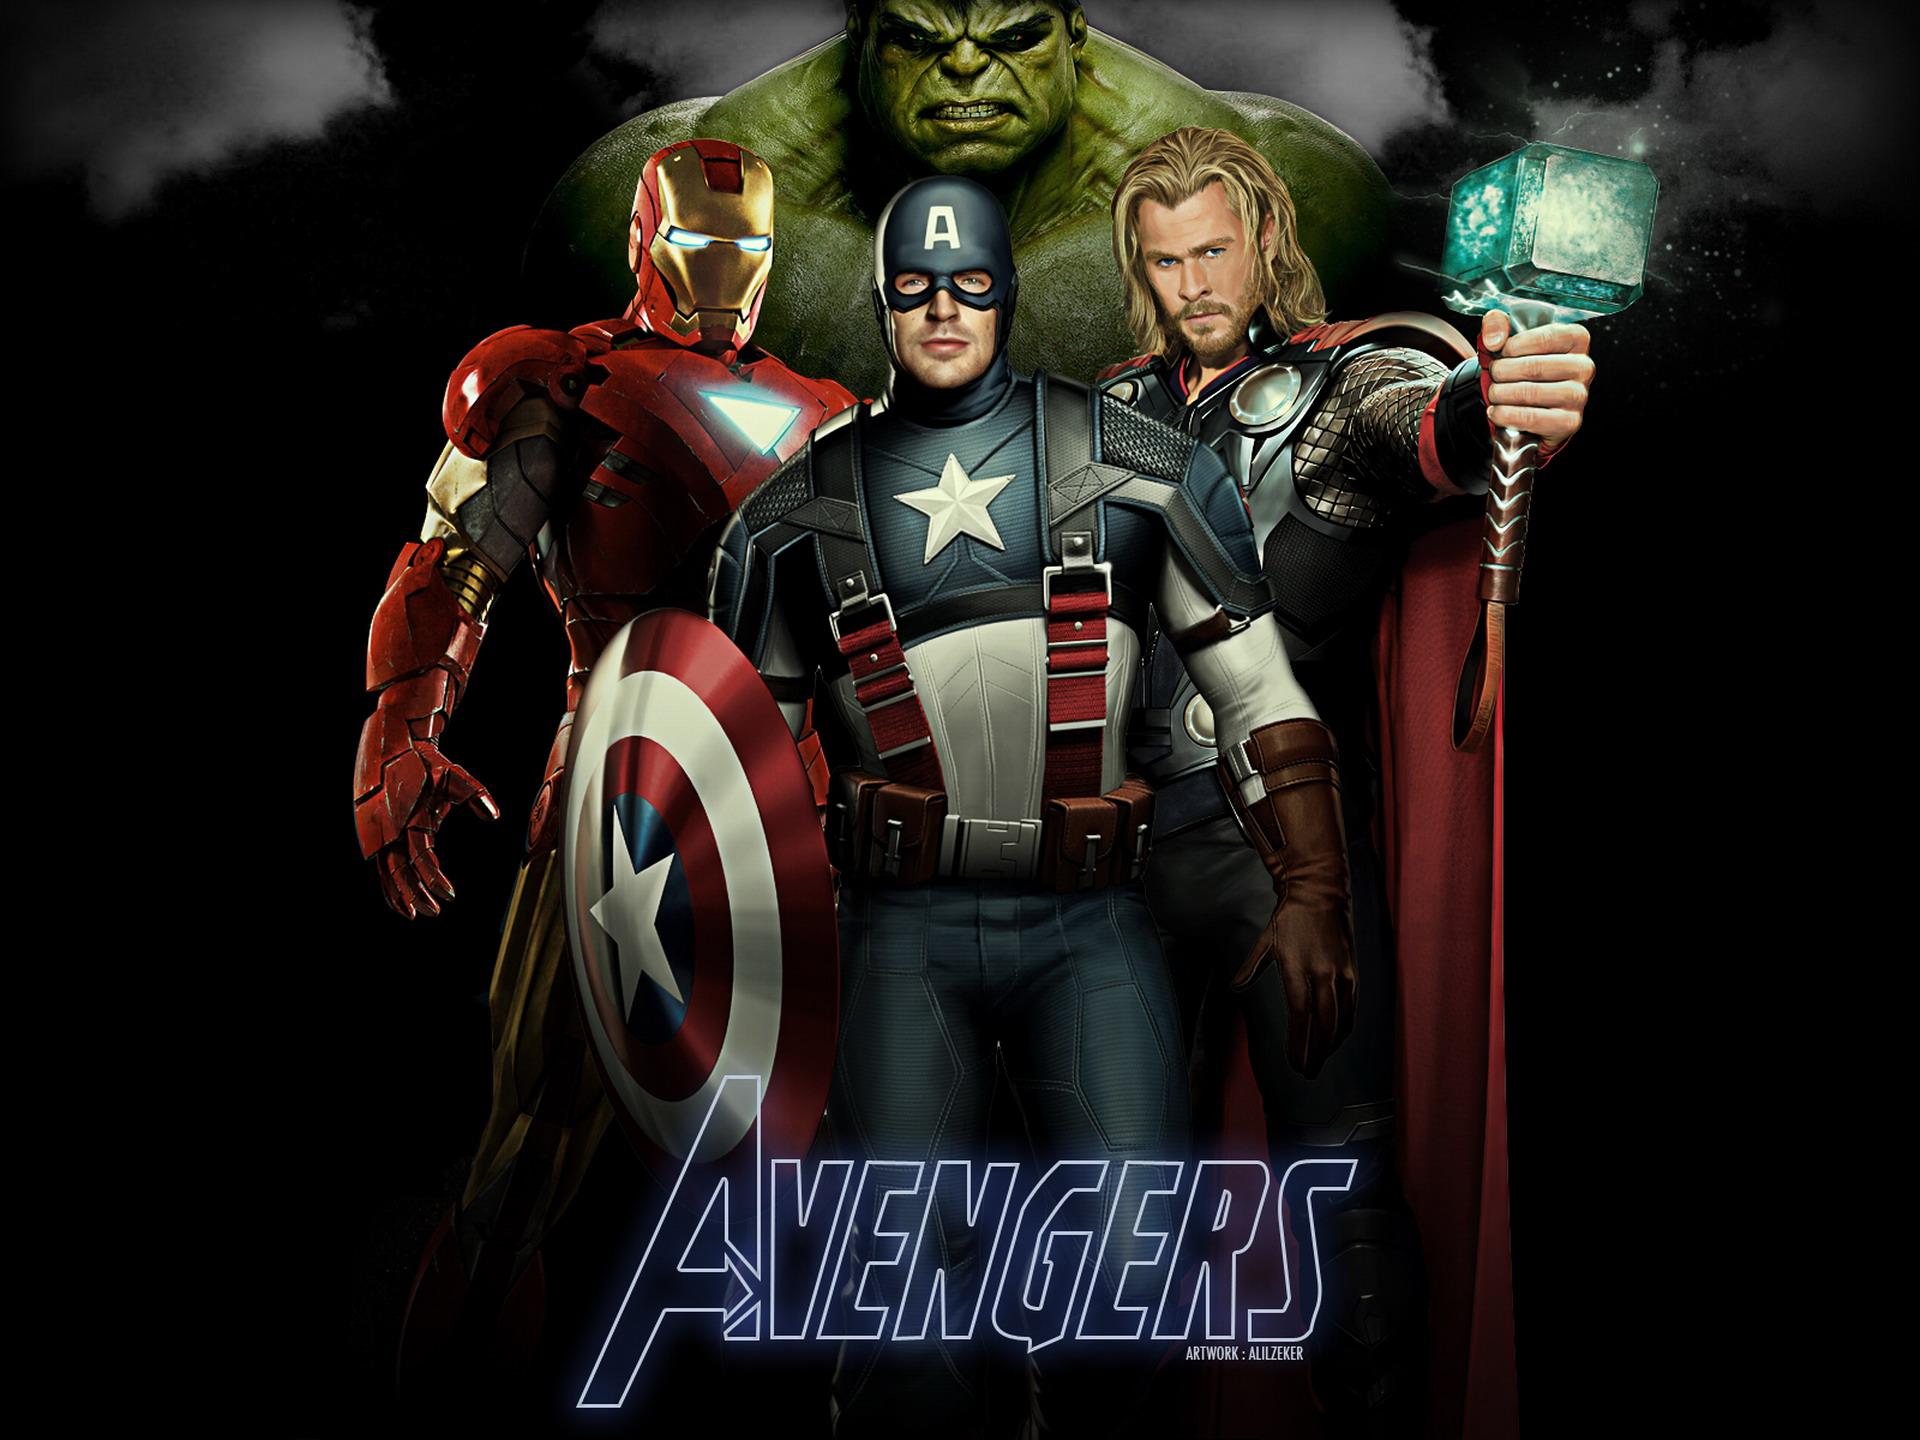 Avengers-Movie-2012-Hd-Wallpaper-1